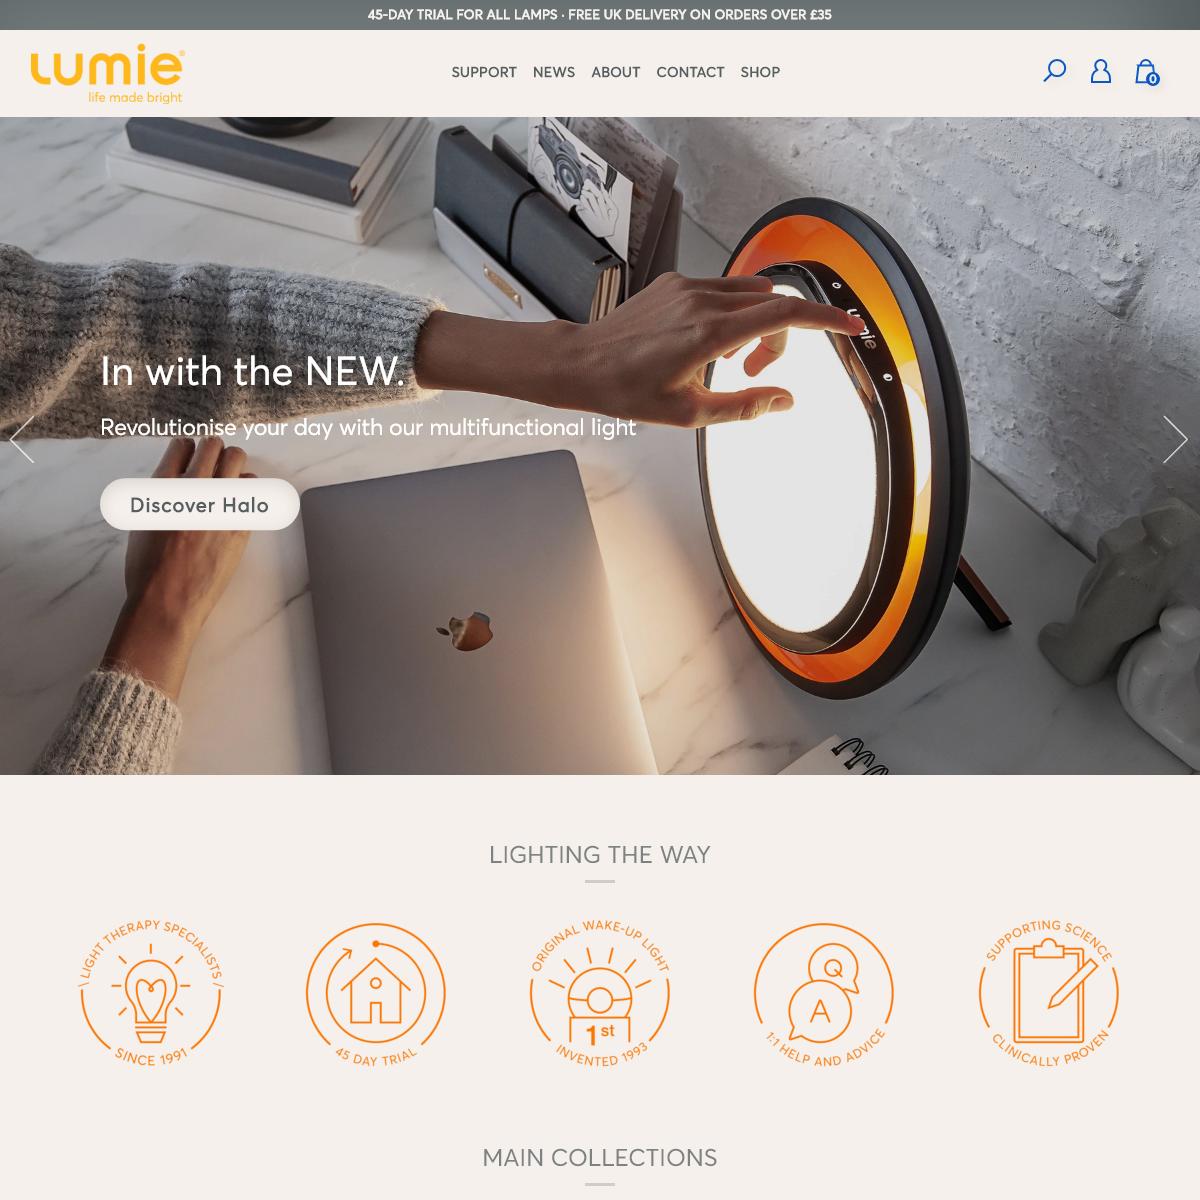 Bodyclock wake-up lights, SAD lamps, Skincare Light Therapy – Lumie